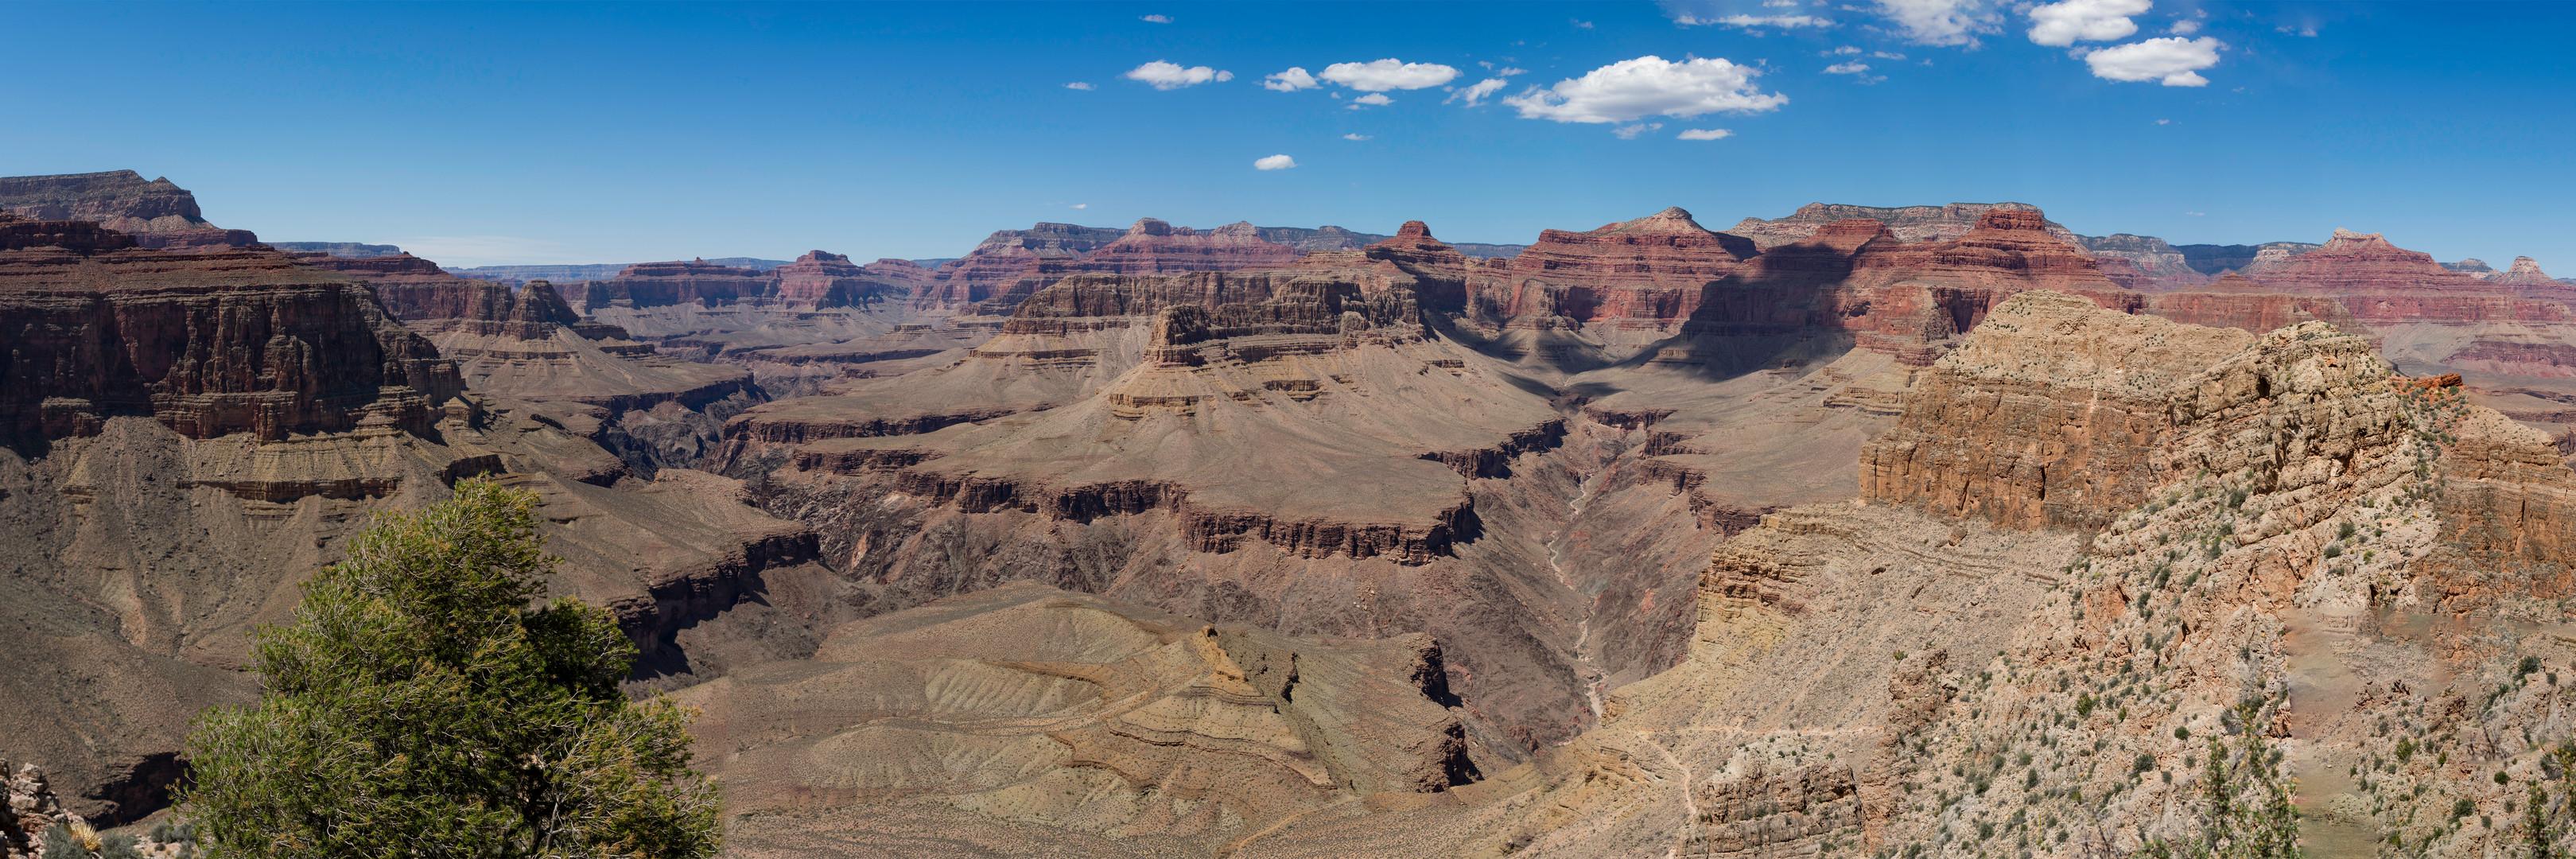 Golden Canyon (25MB).jpg